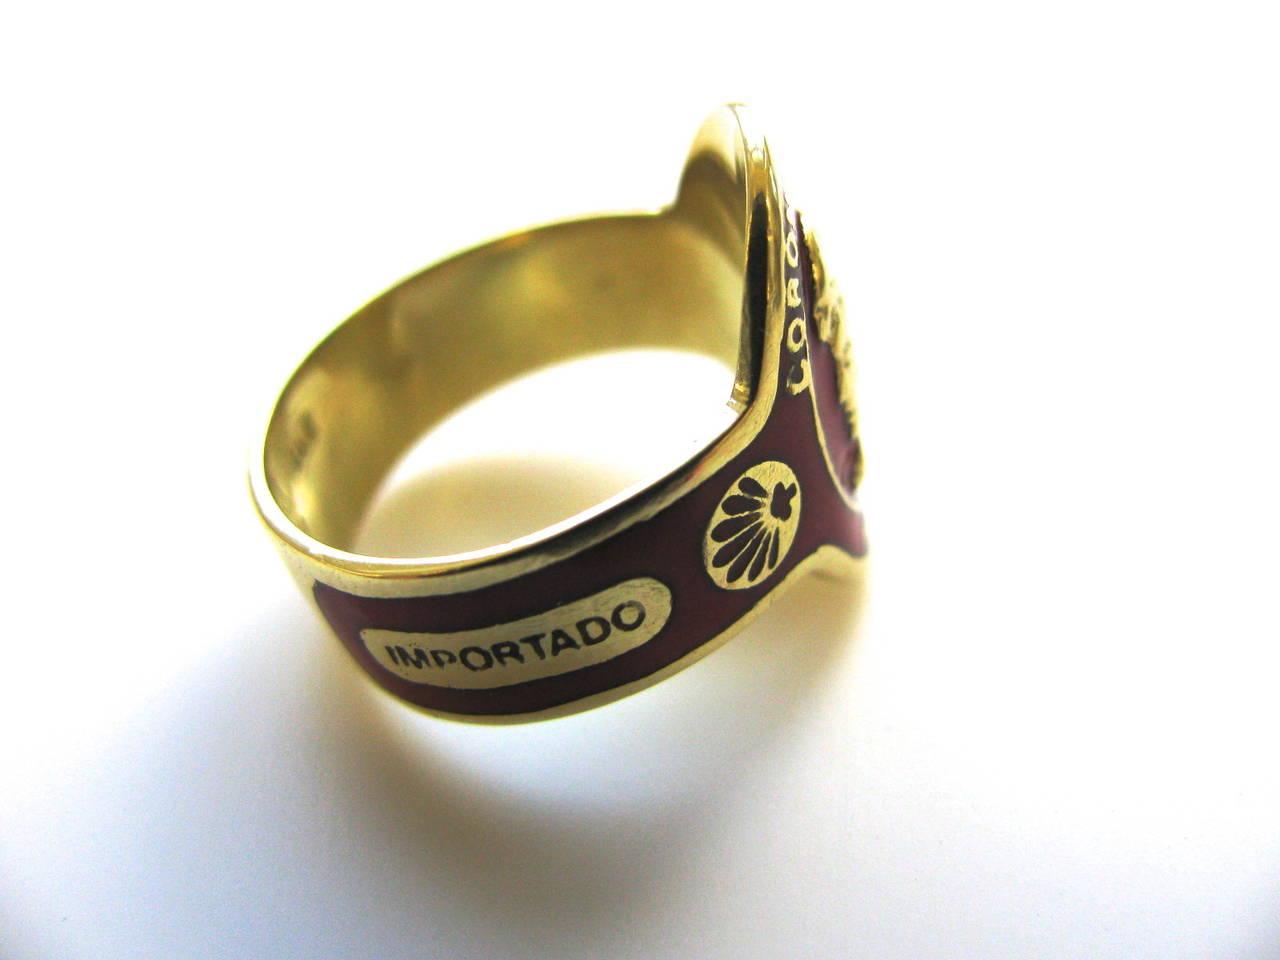 cartier enamel gold cigar band ring at 1stdibs